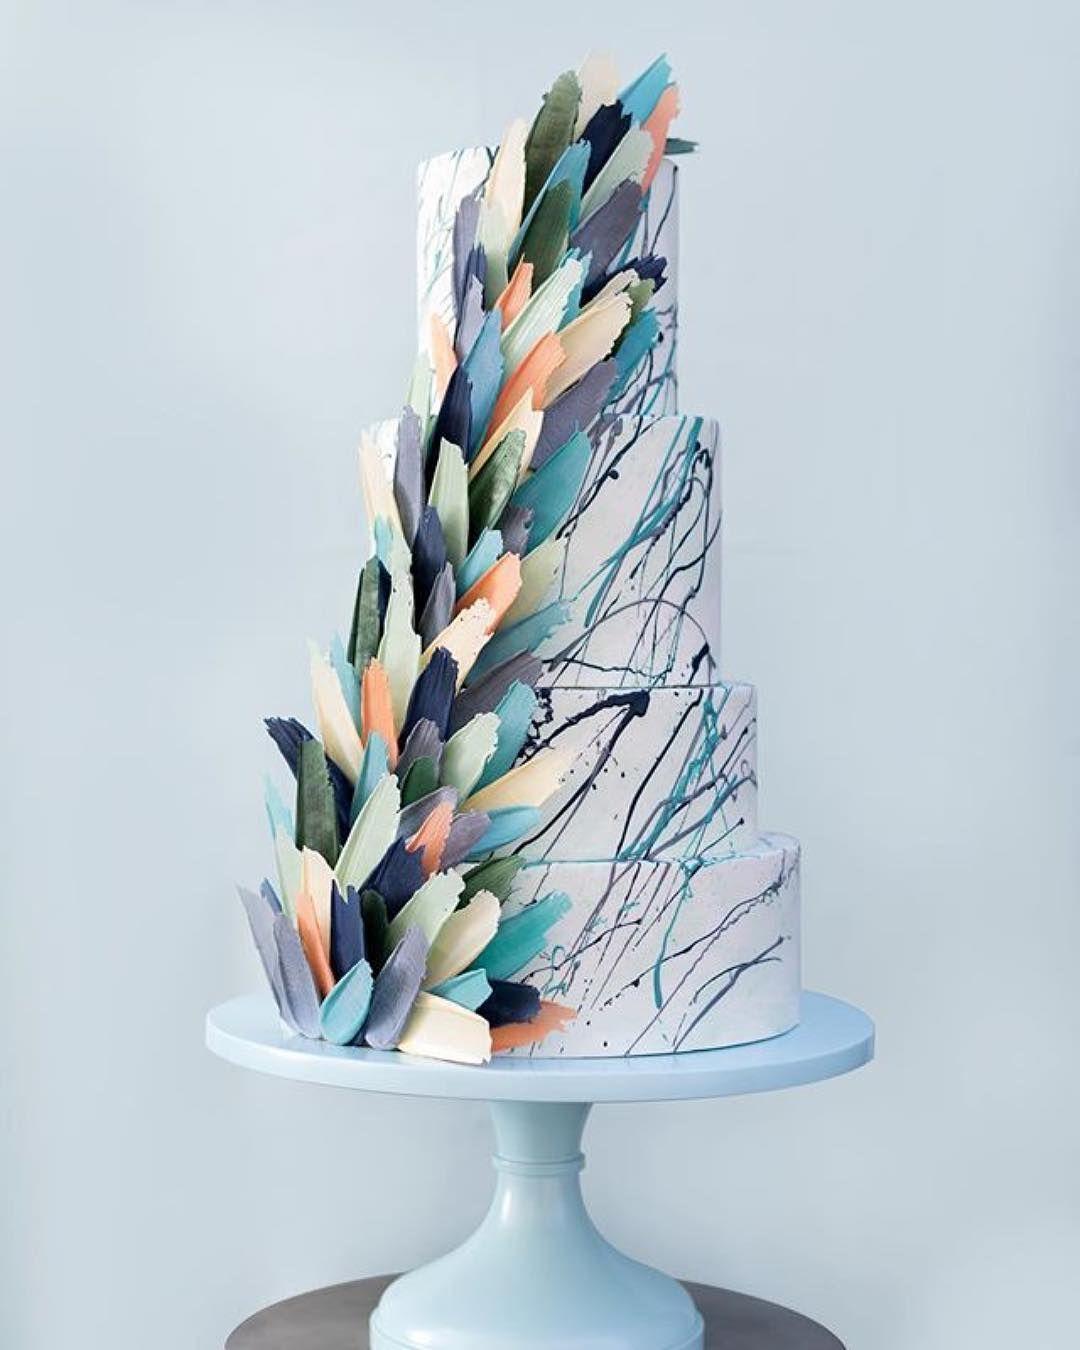 #sarahsstands #cakestandlove #cakedesign #cakedecorating #cakeart #cakeartist #cake #wedding #weddingcake   #dessert  #bluecake #blue #kalabasa_inspiration